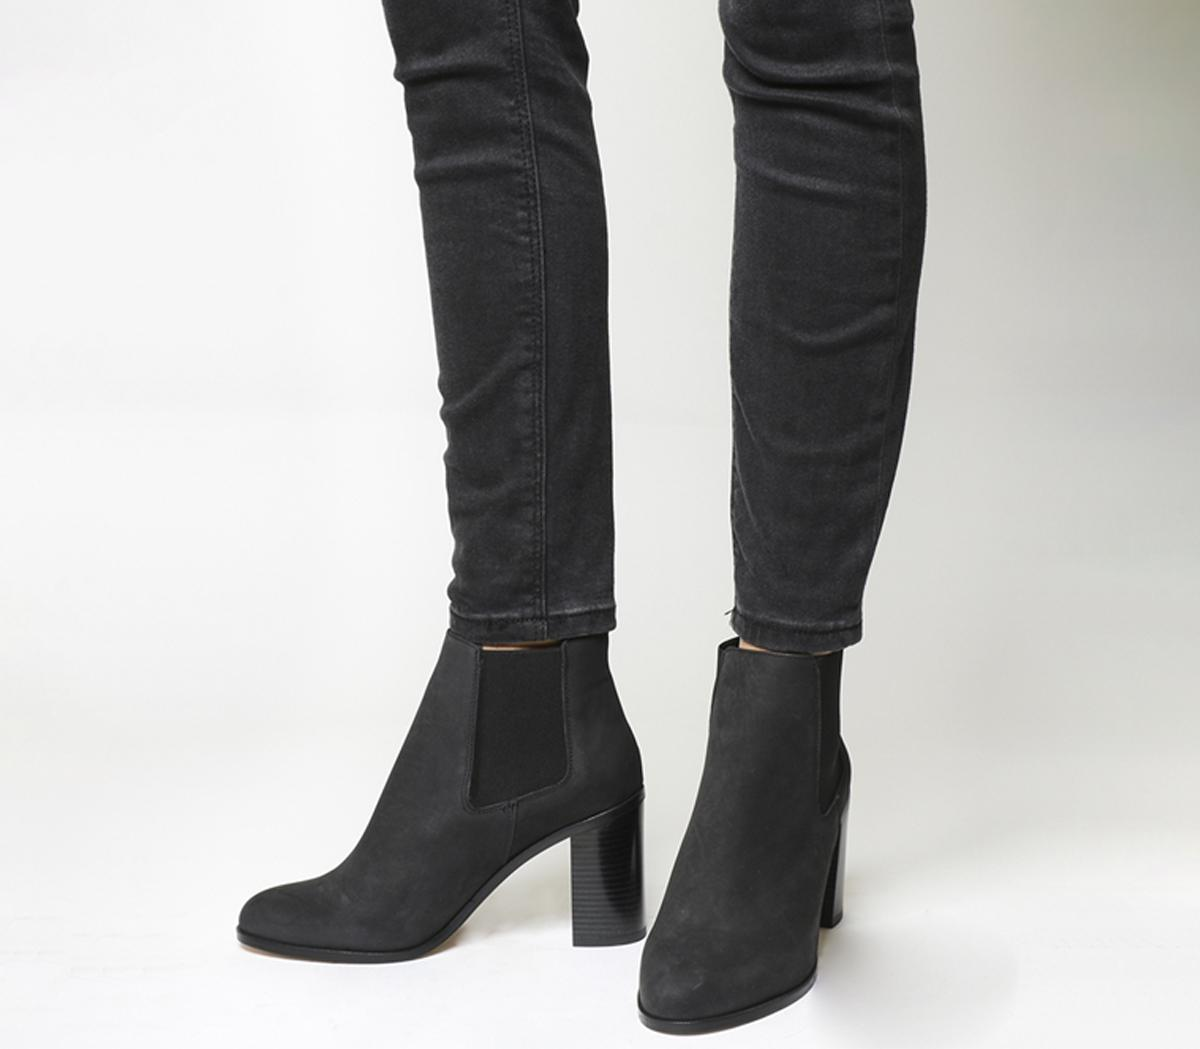 6012a4d8eaf Lyst - Office Logo Block Heel Chelsea Boots in Black